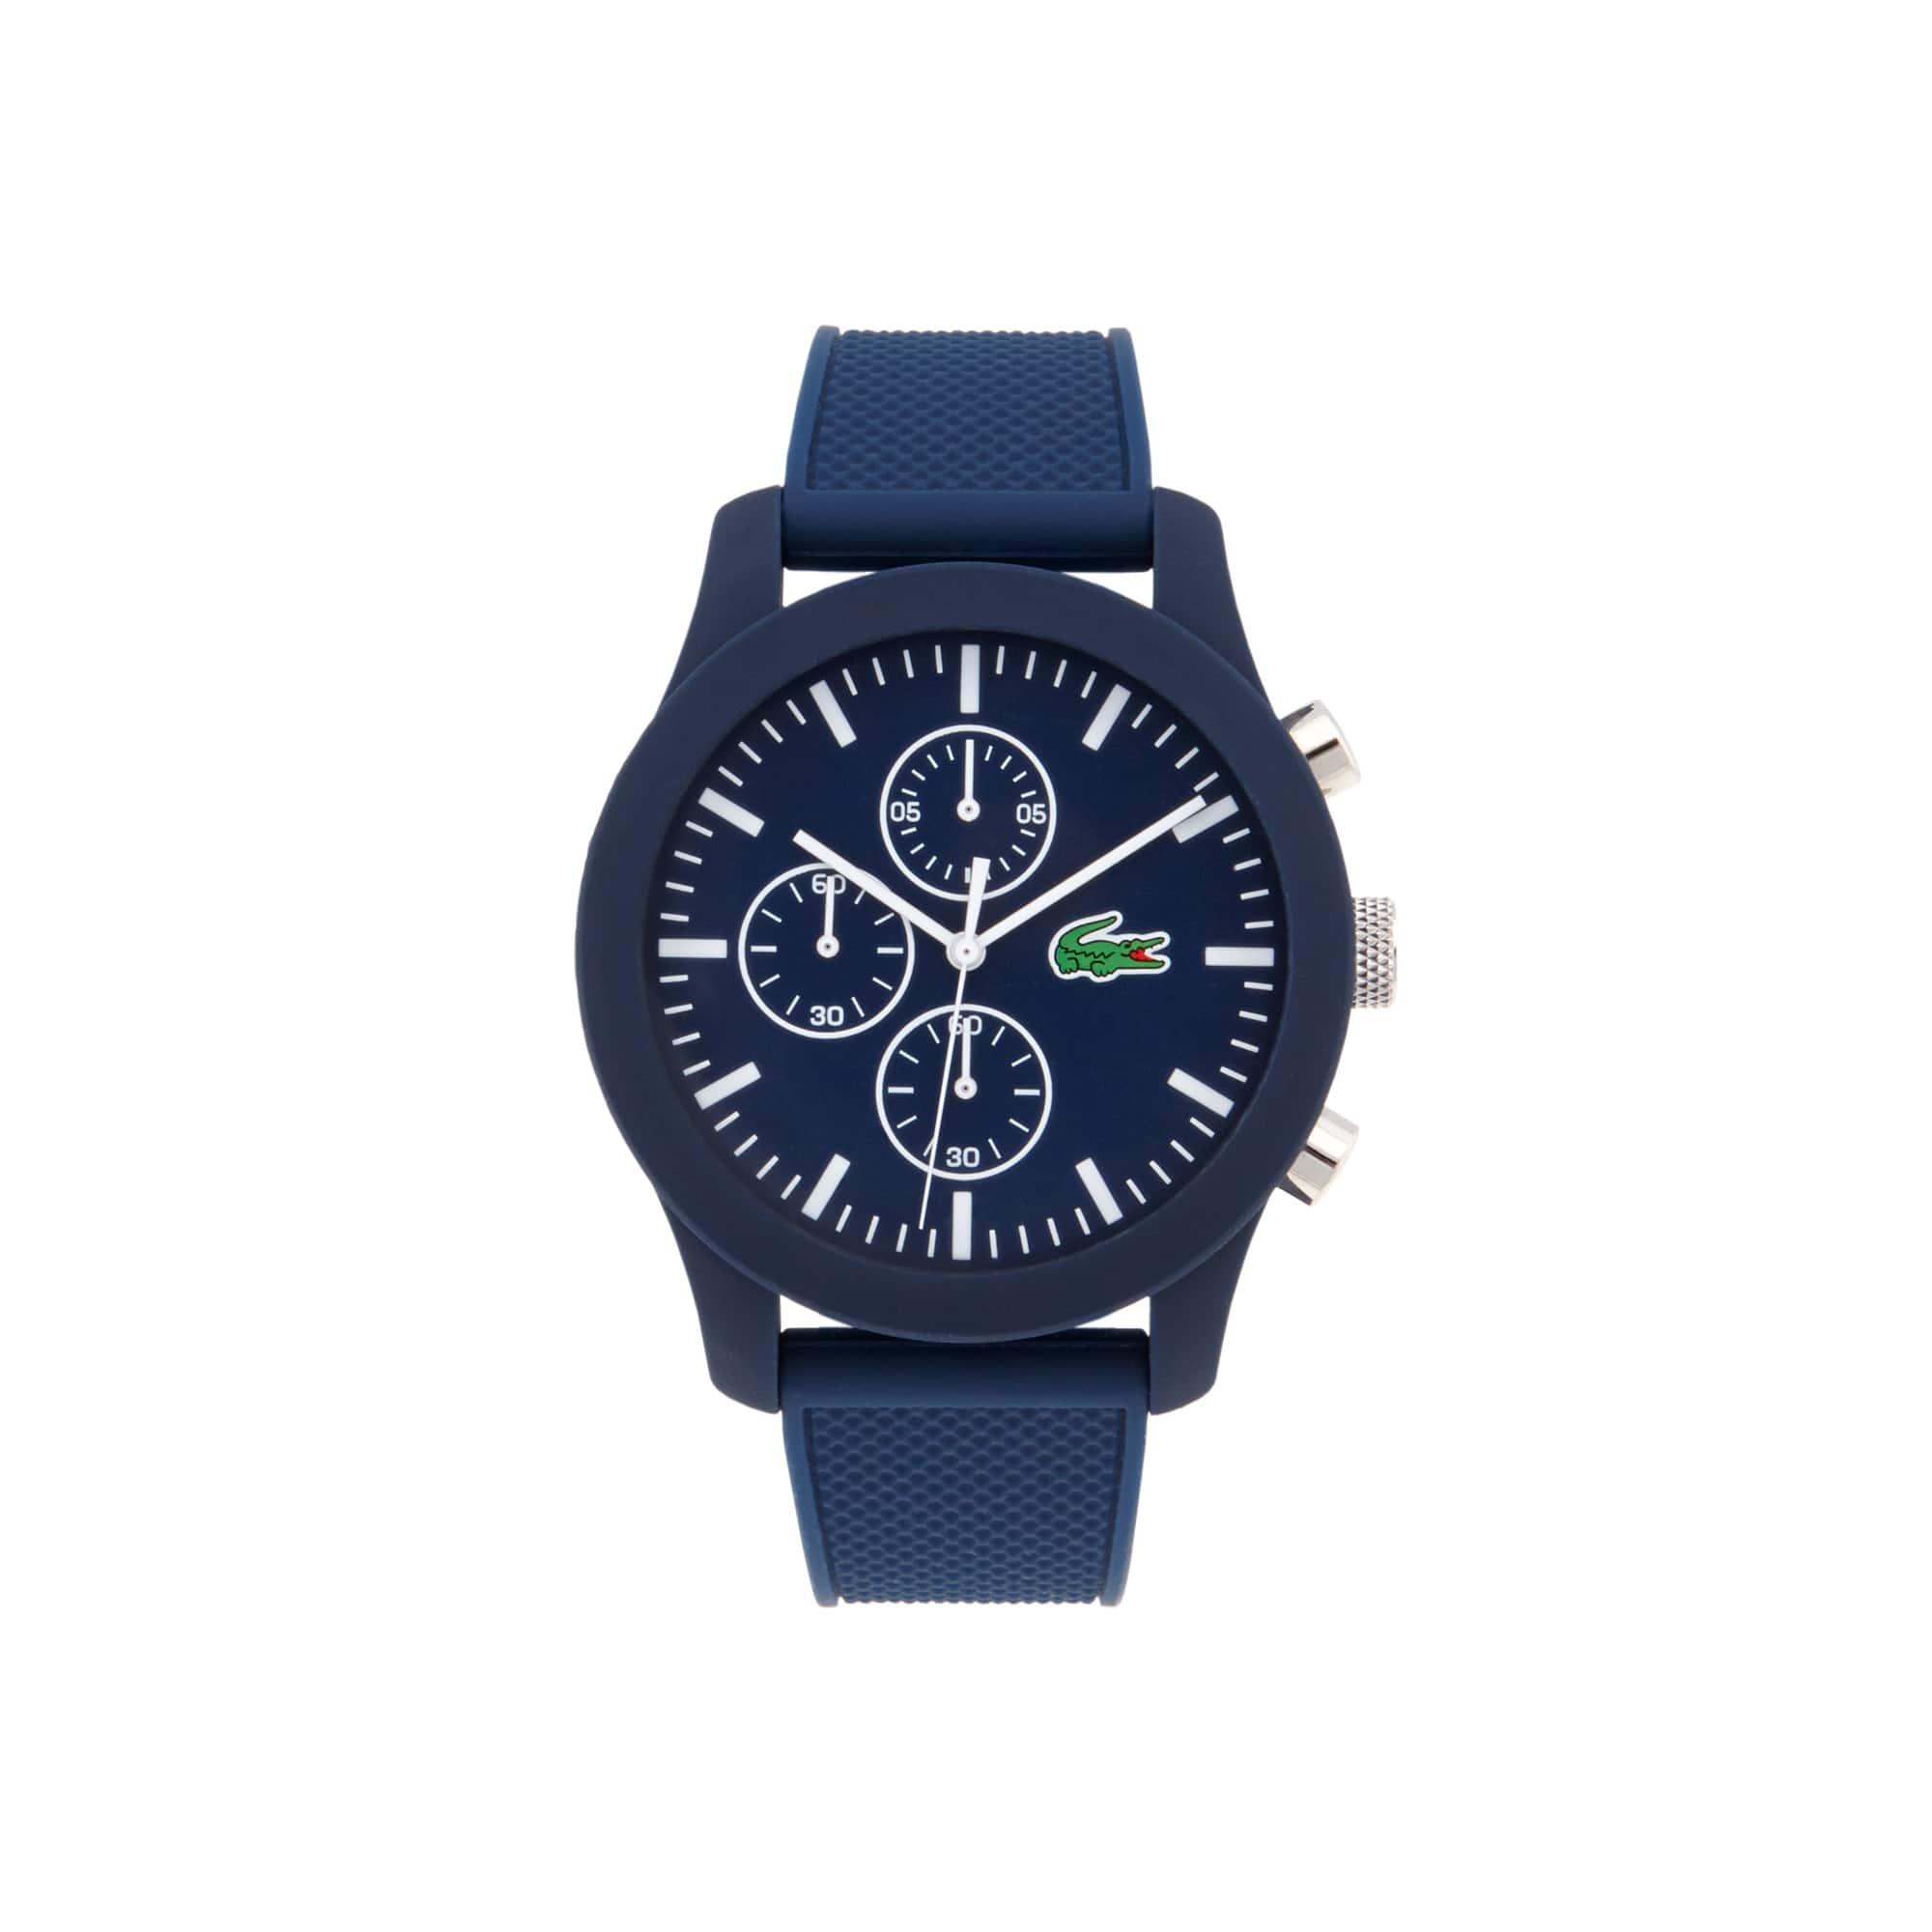 Relógio Lacoste.12.12 com cronógrafo e pulseira de silicone azul